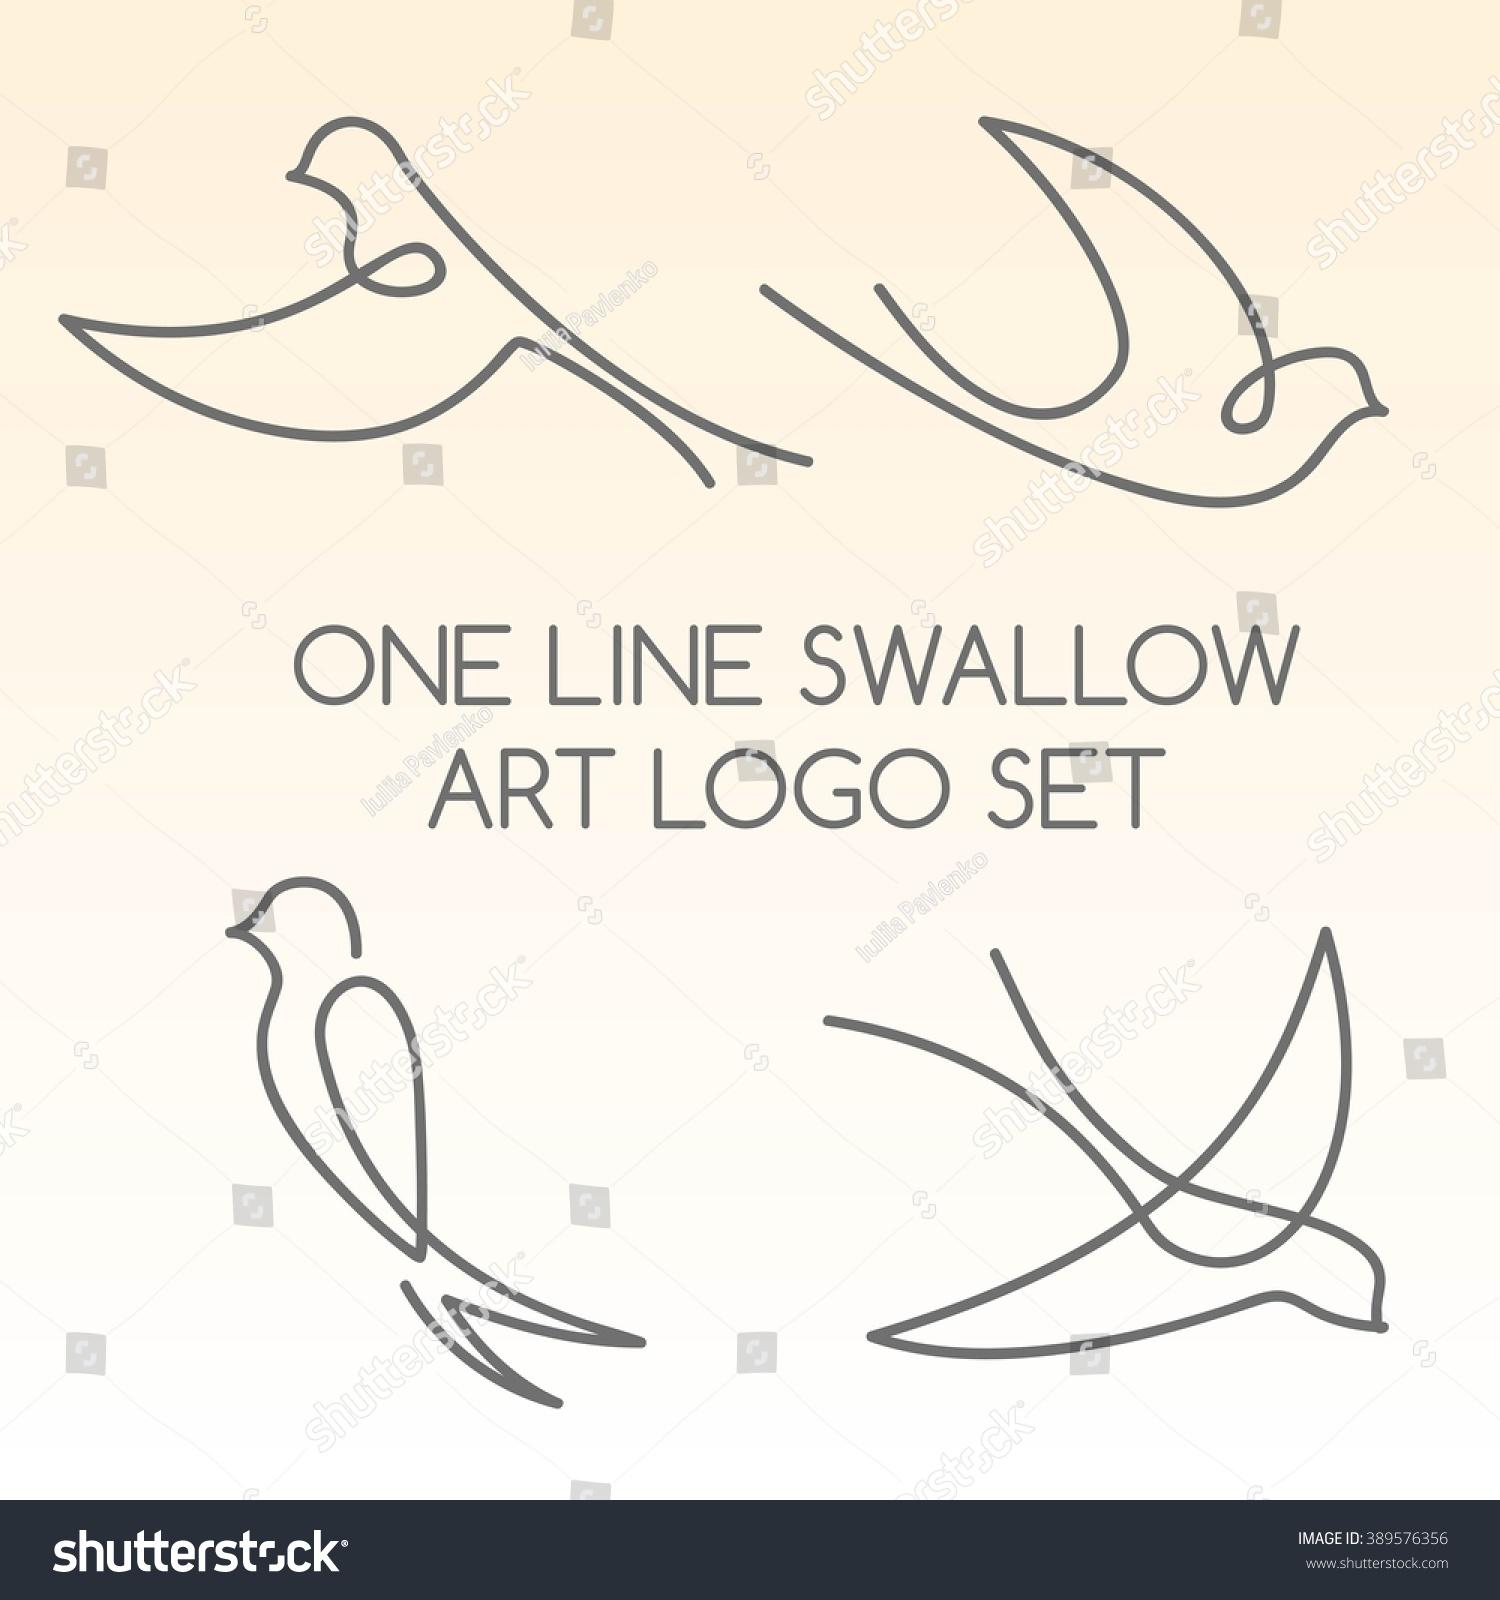 Single Line Vector Art : One line swallow art logo set stock vector illustration